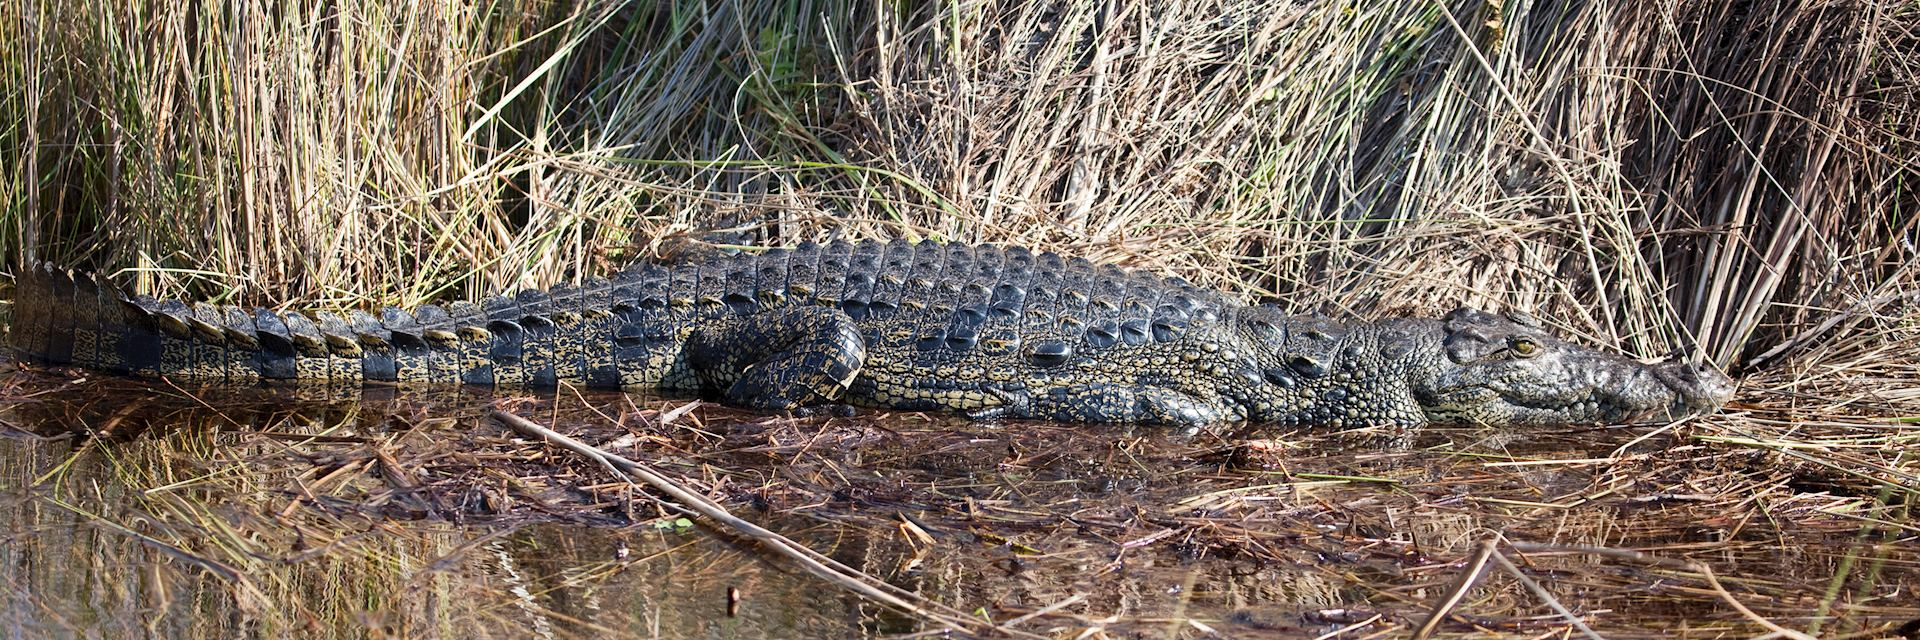 Crocodile, Okavango Delta